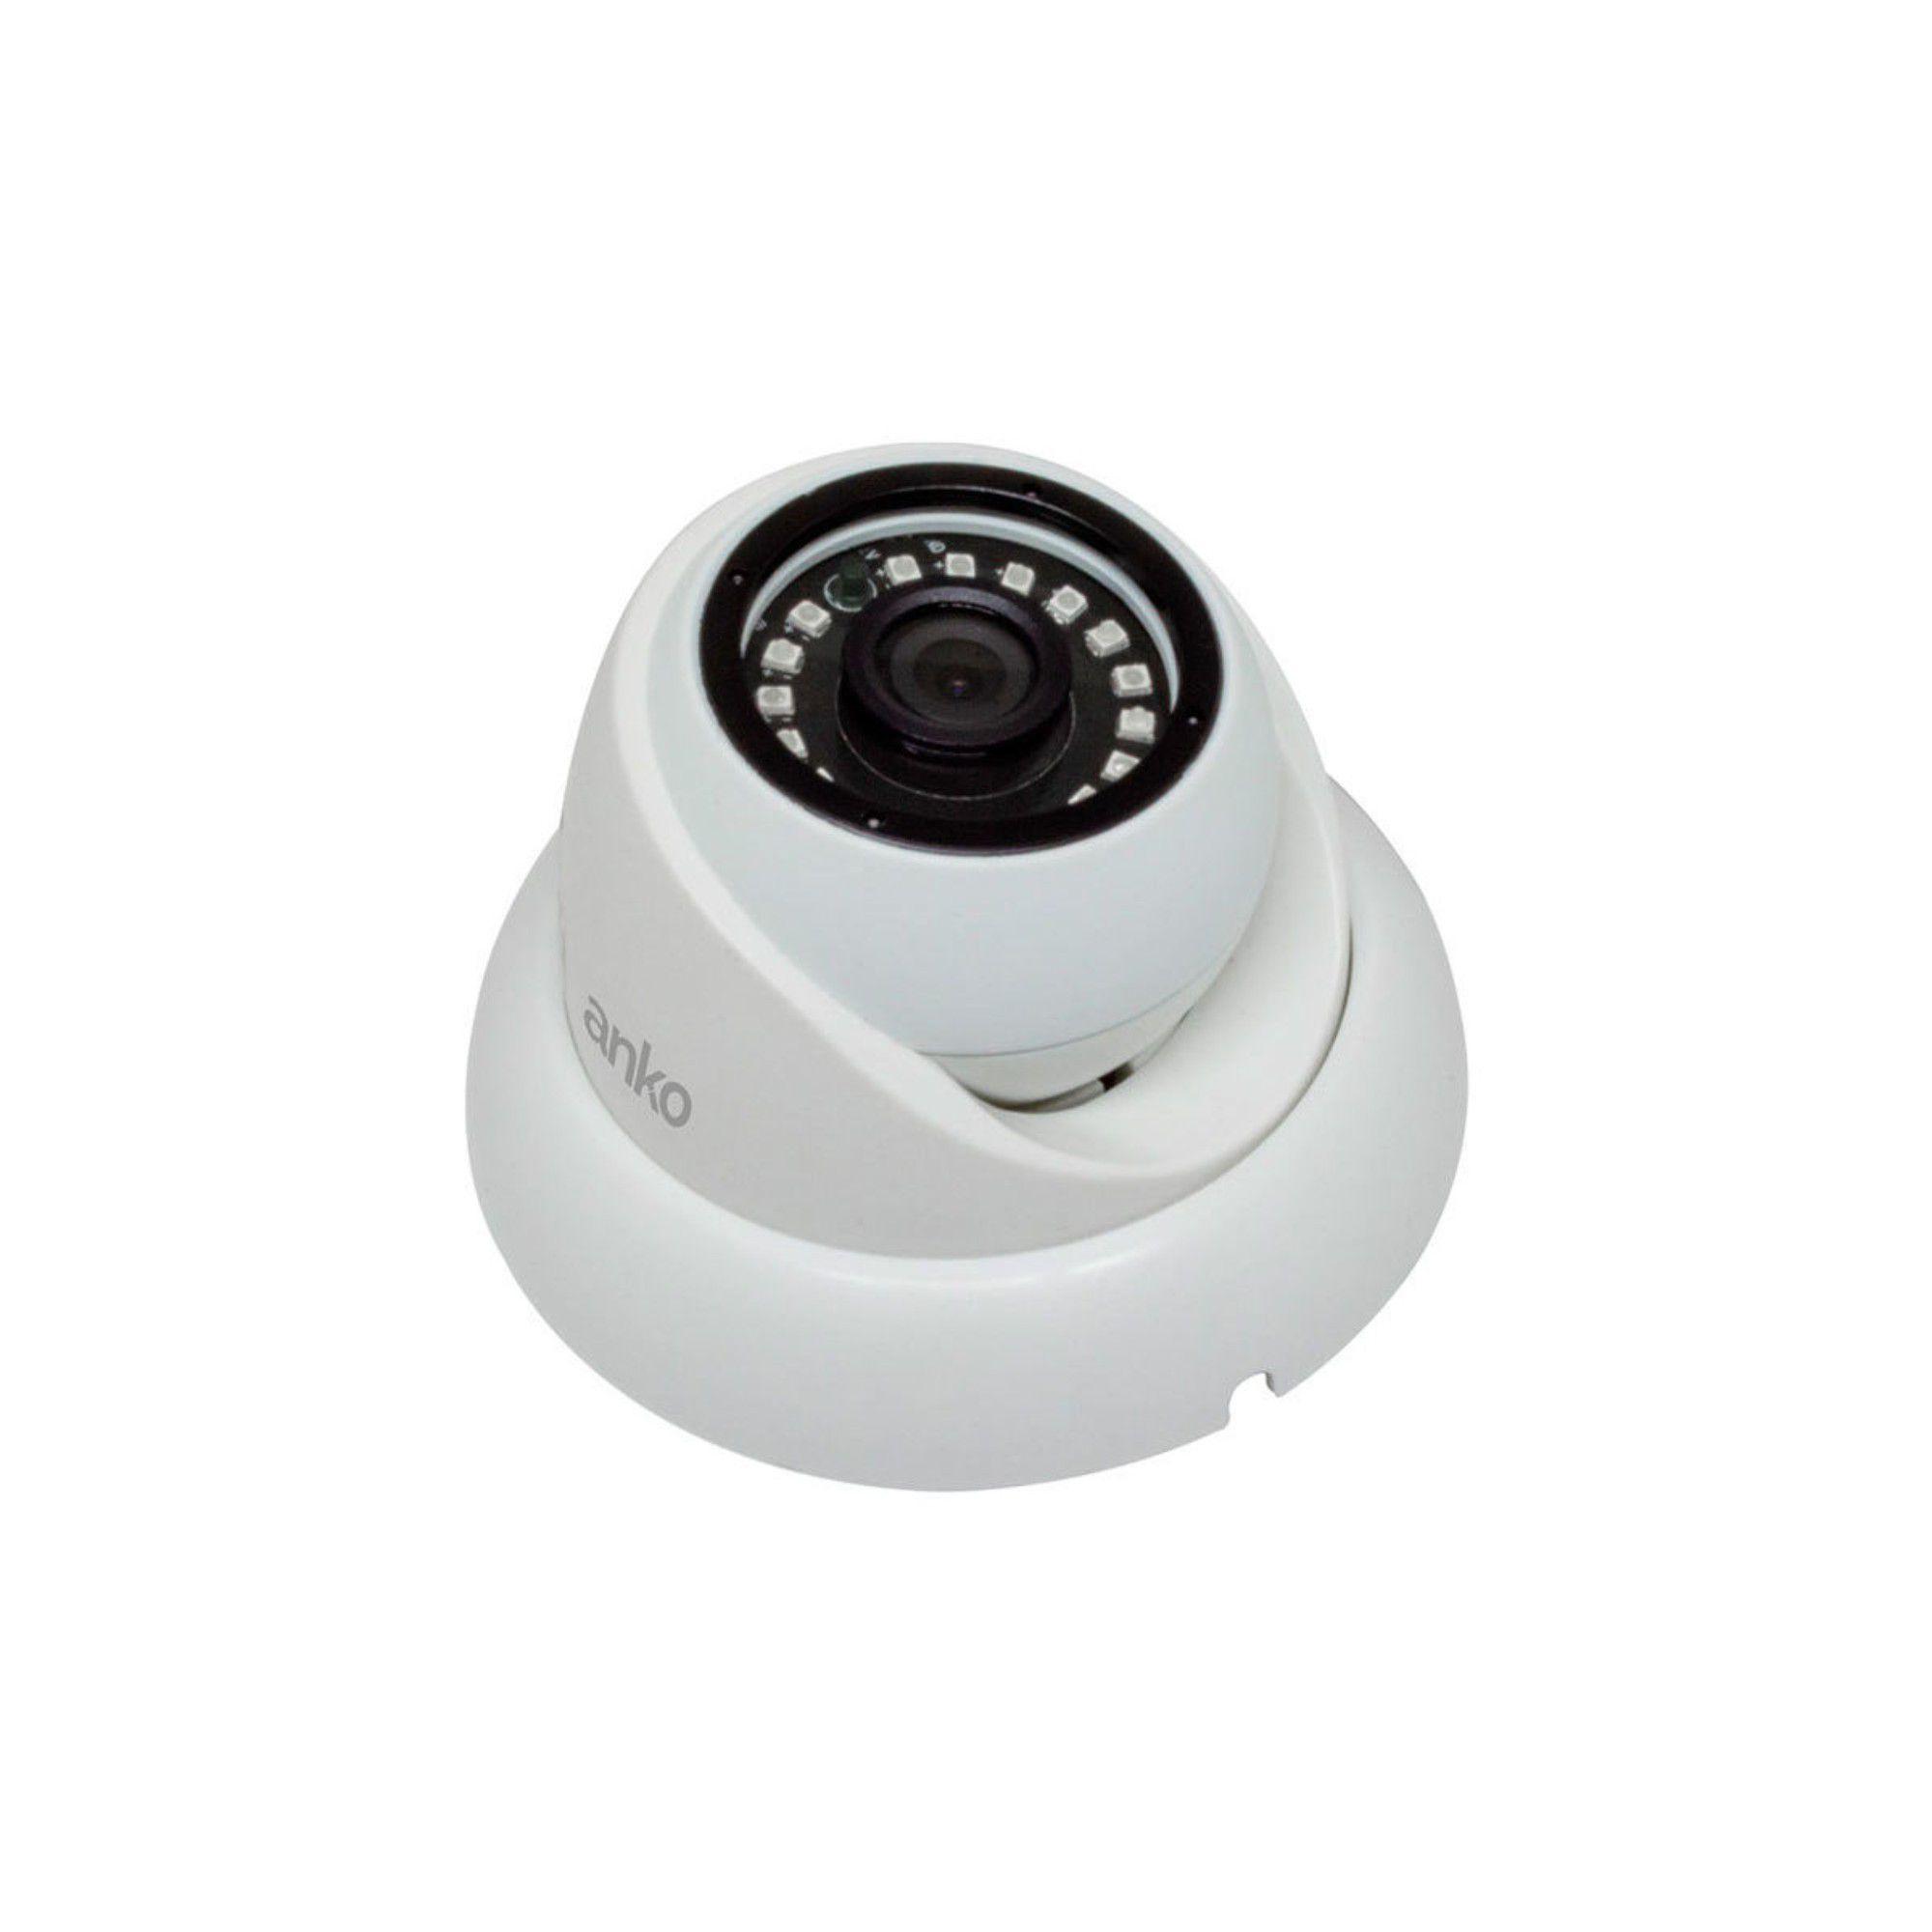 Câmera Infra Dome ANKO AHD 720p 2,8mm 30 Metros